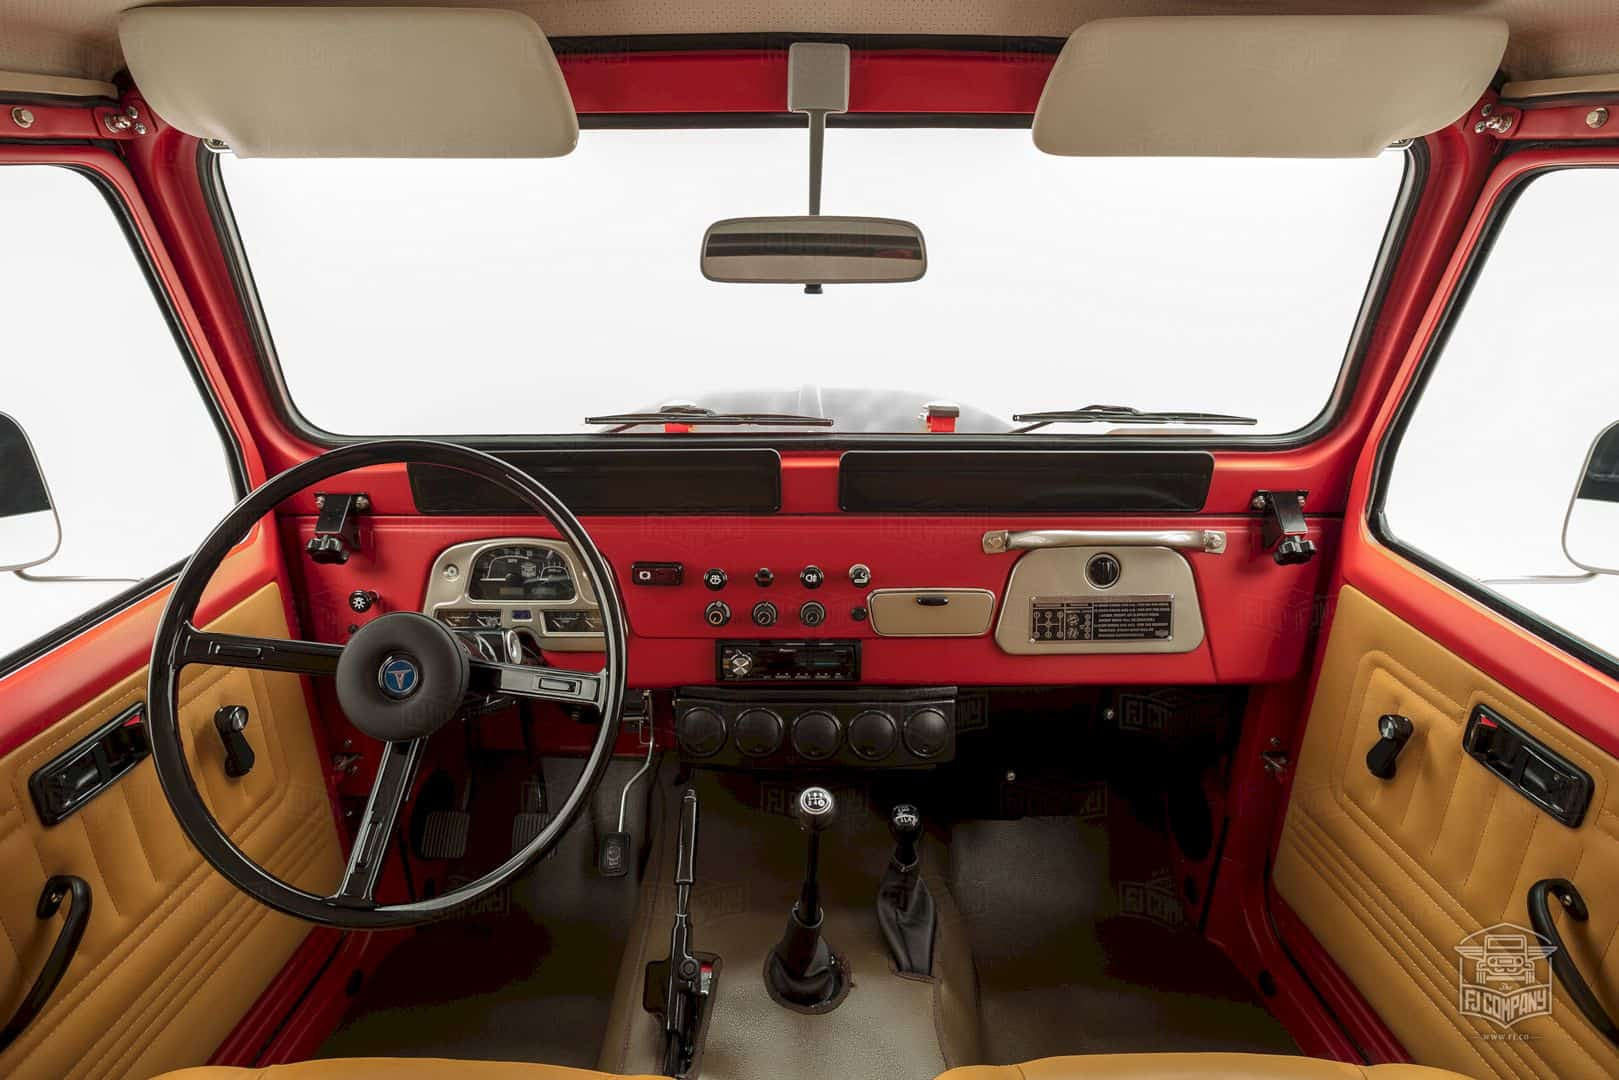 1981 Toyota Land Cruiser Fj43 4